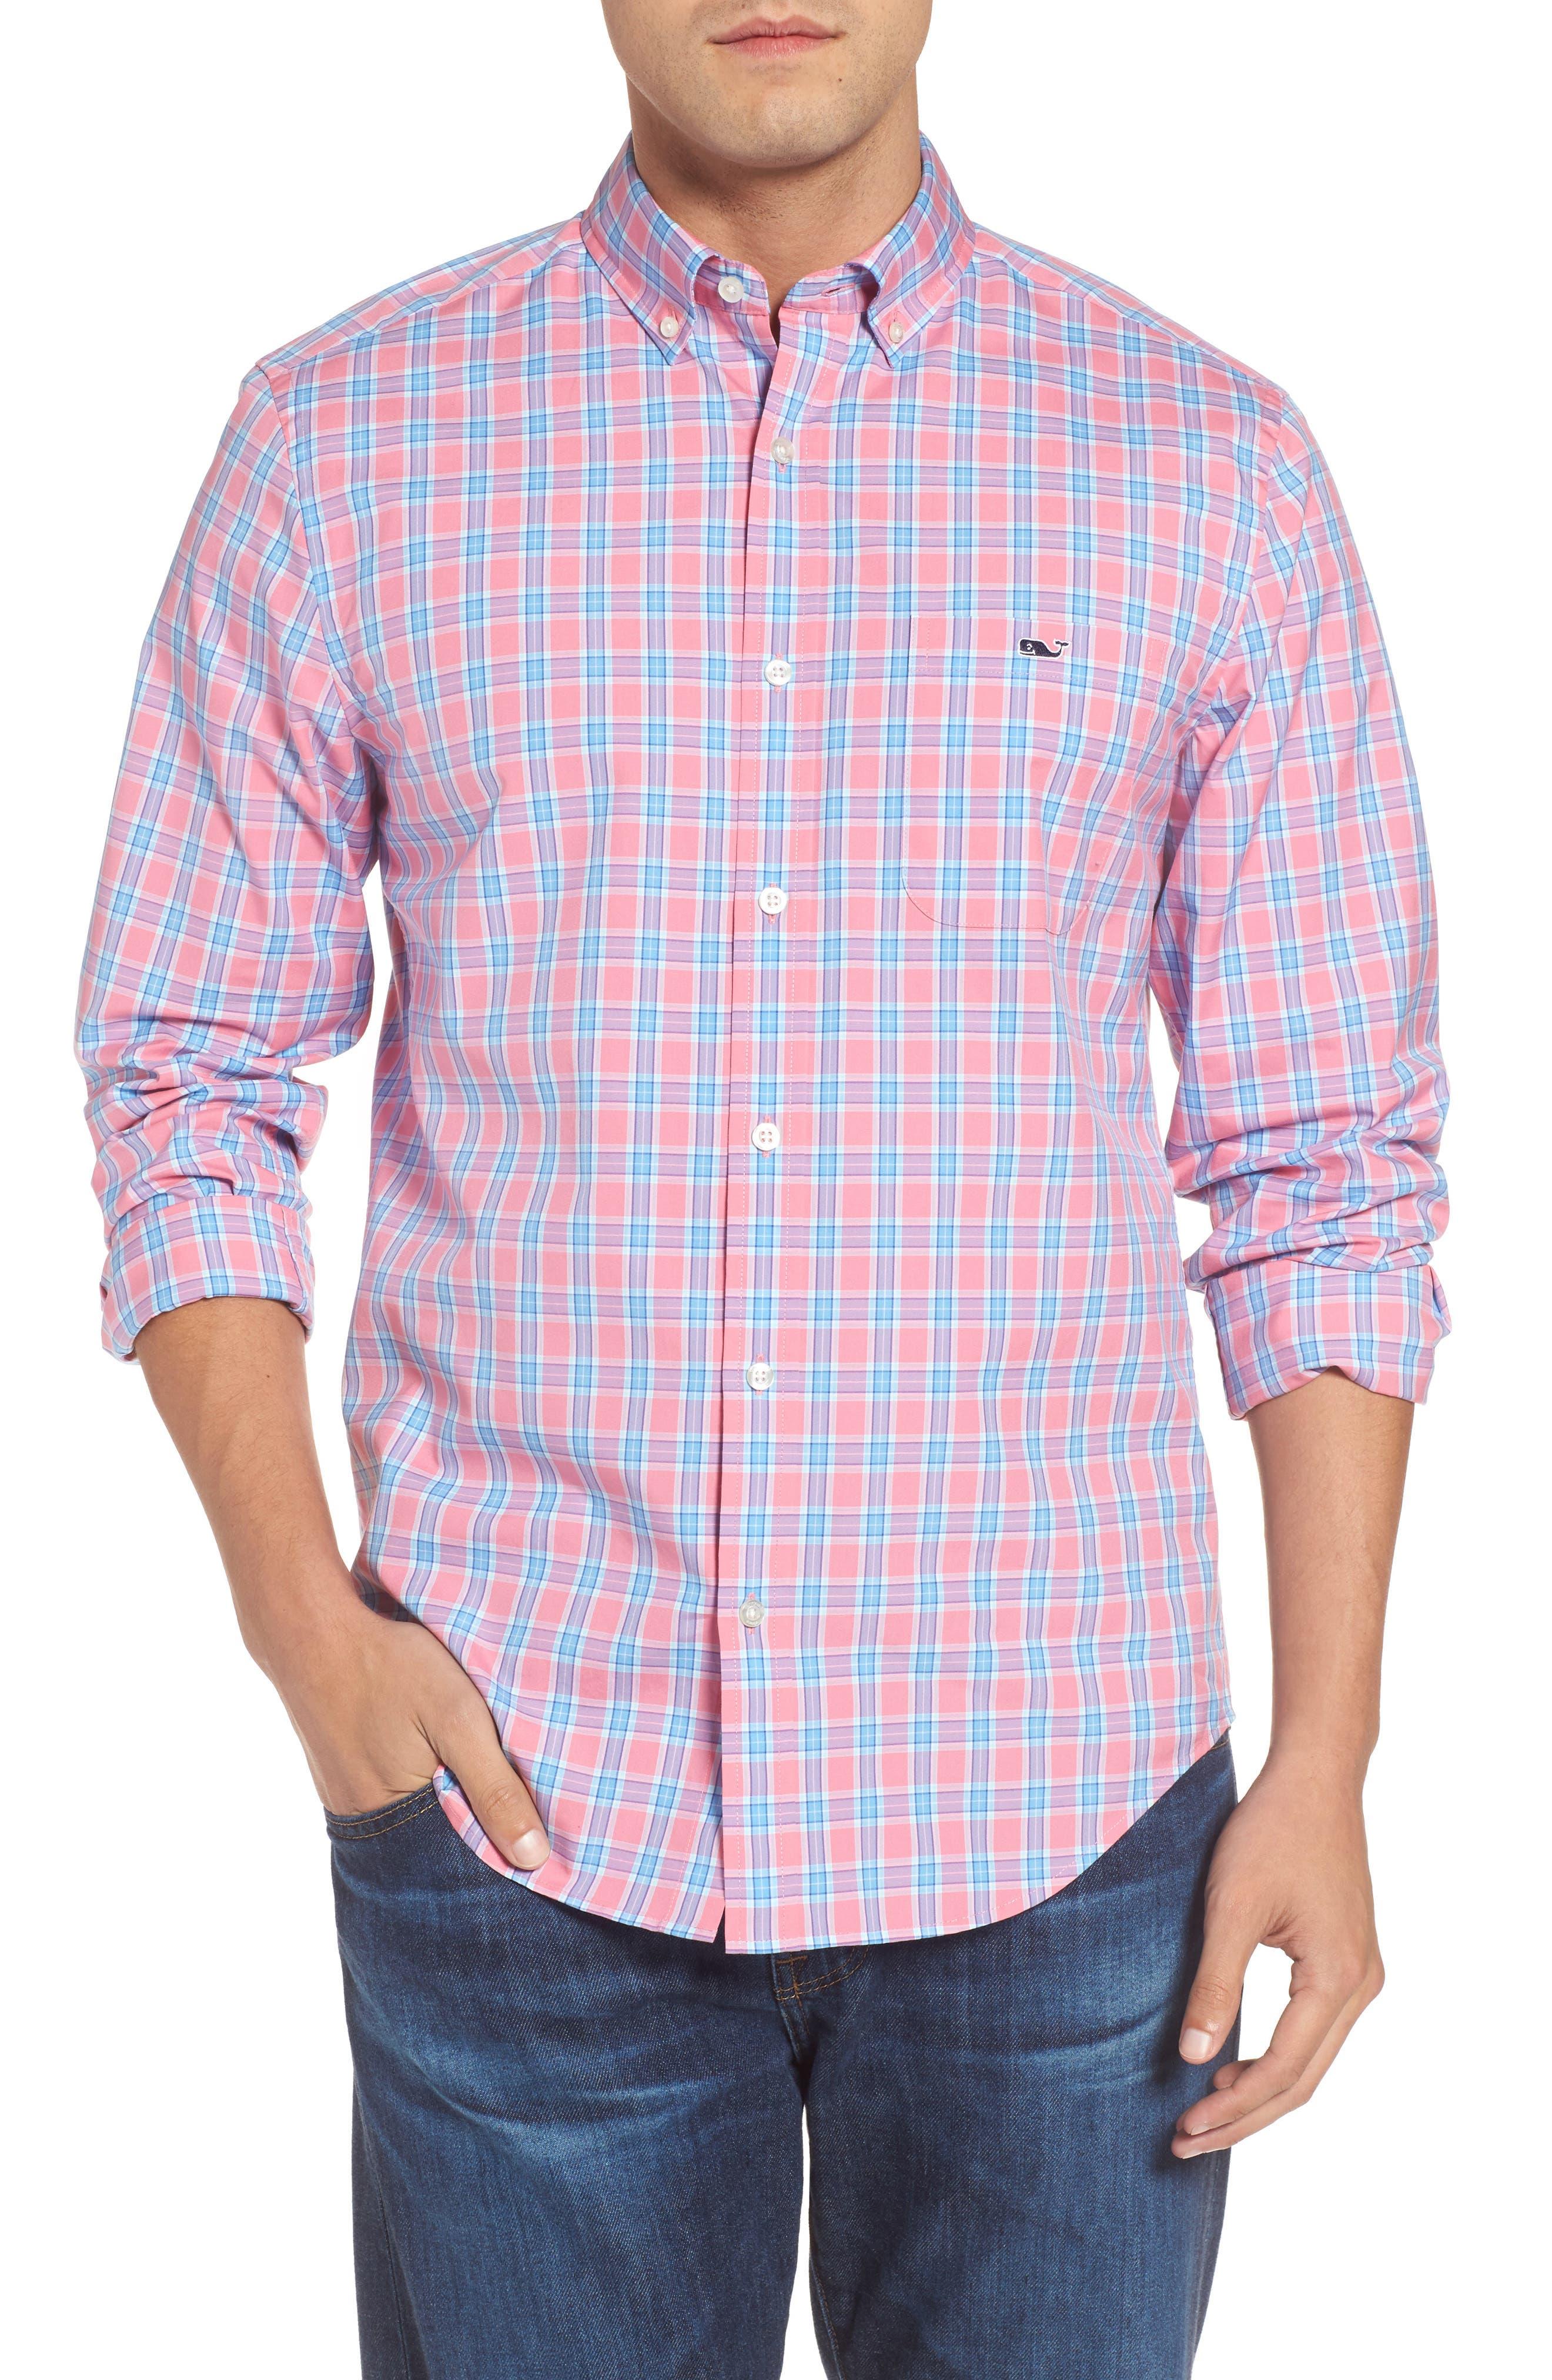 Tucker Bayard Classic Fit Plaid Sport Shirt,                             Main thumbnail 1, color,                             650